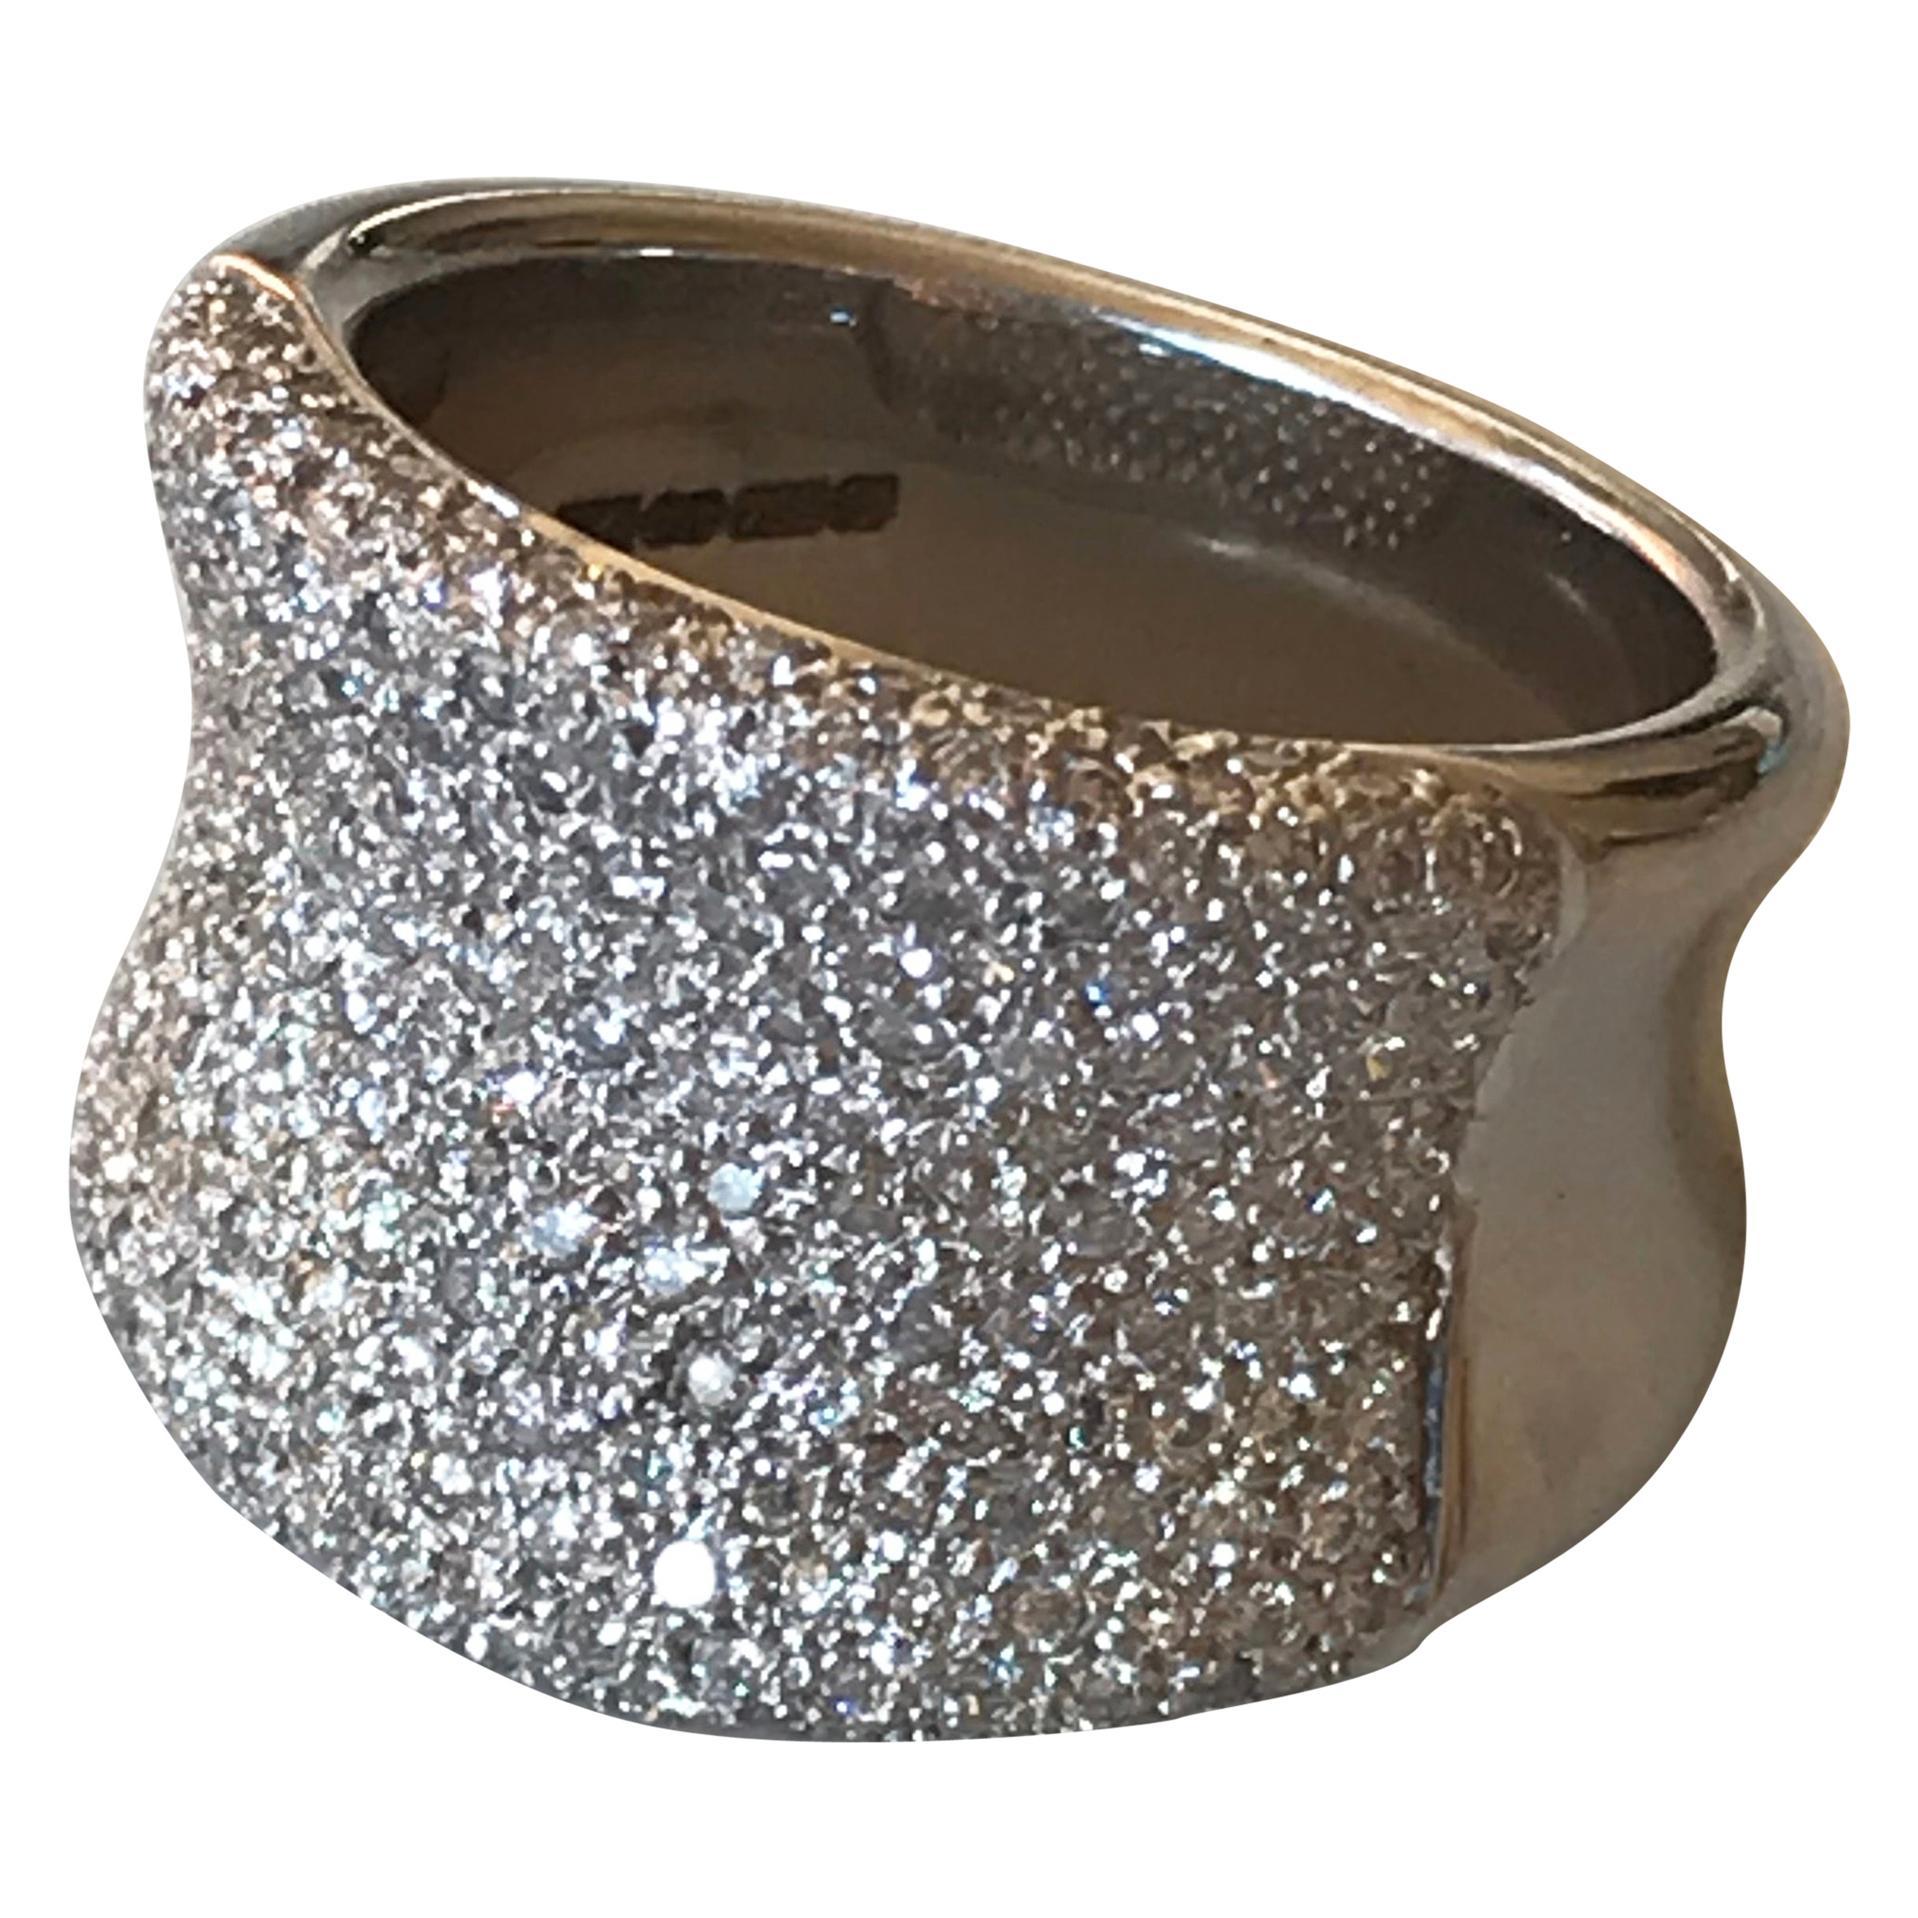 Diamond Pavé Bombe Concave Cocktail Ring, 18 Carat White Gold